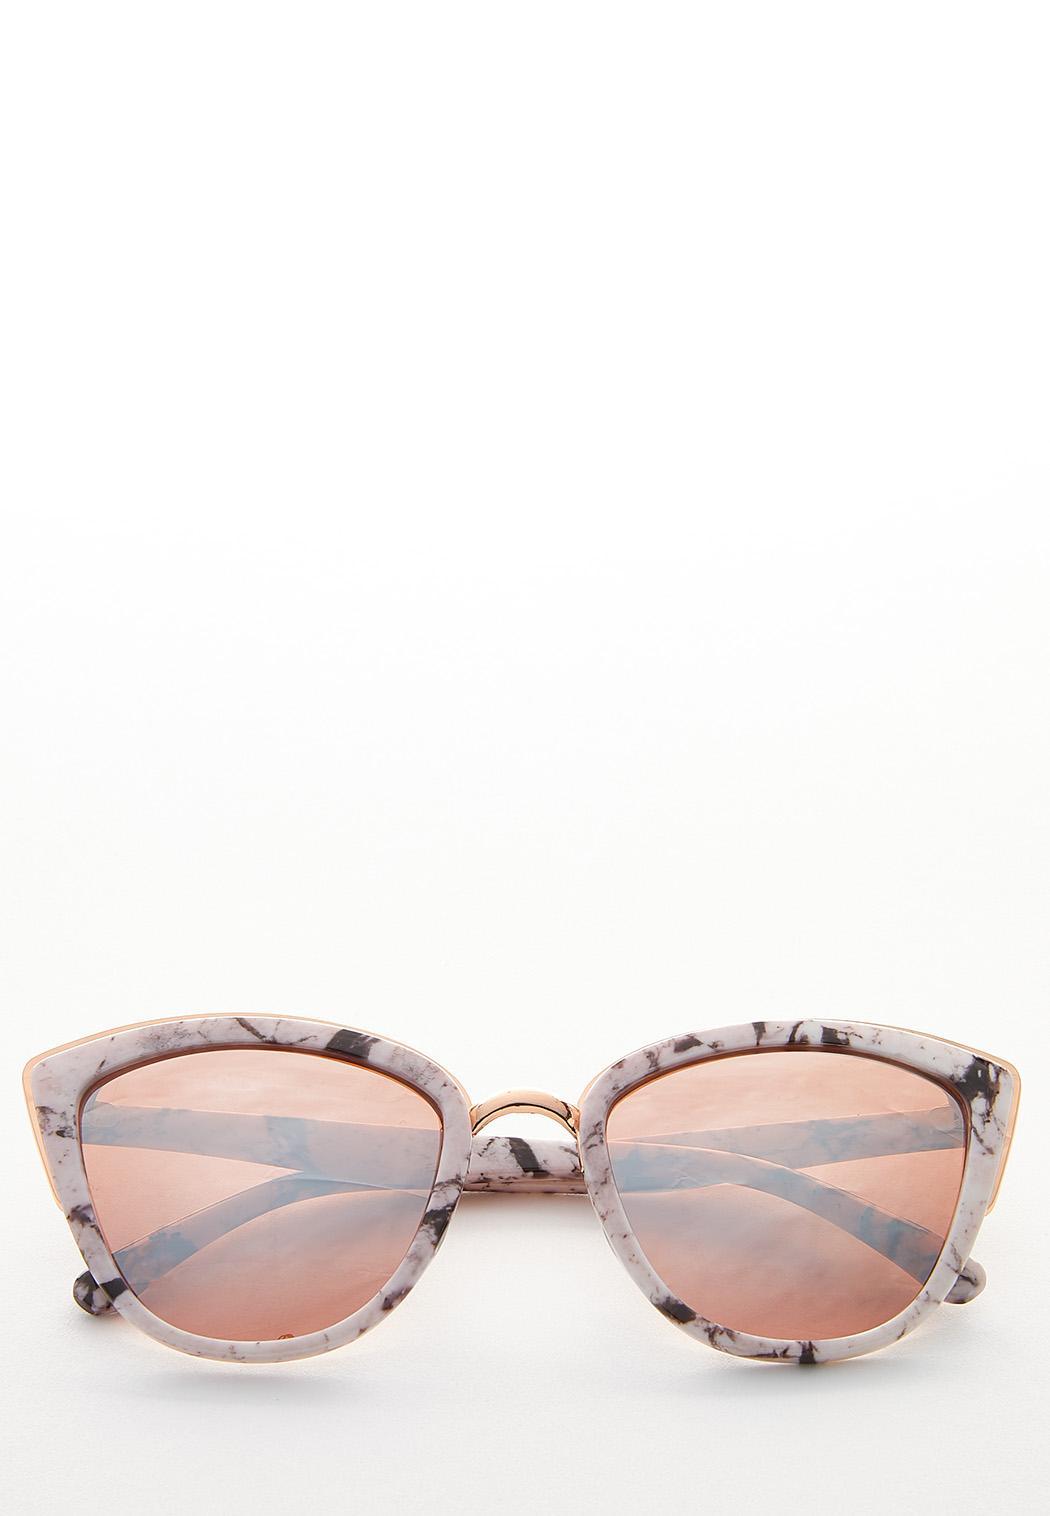 Marbled Mirror Lens Sunglasses